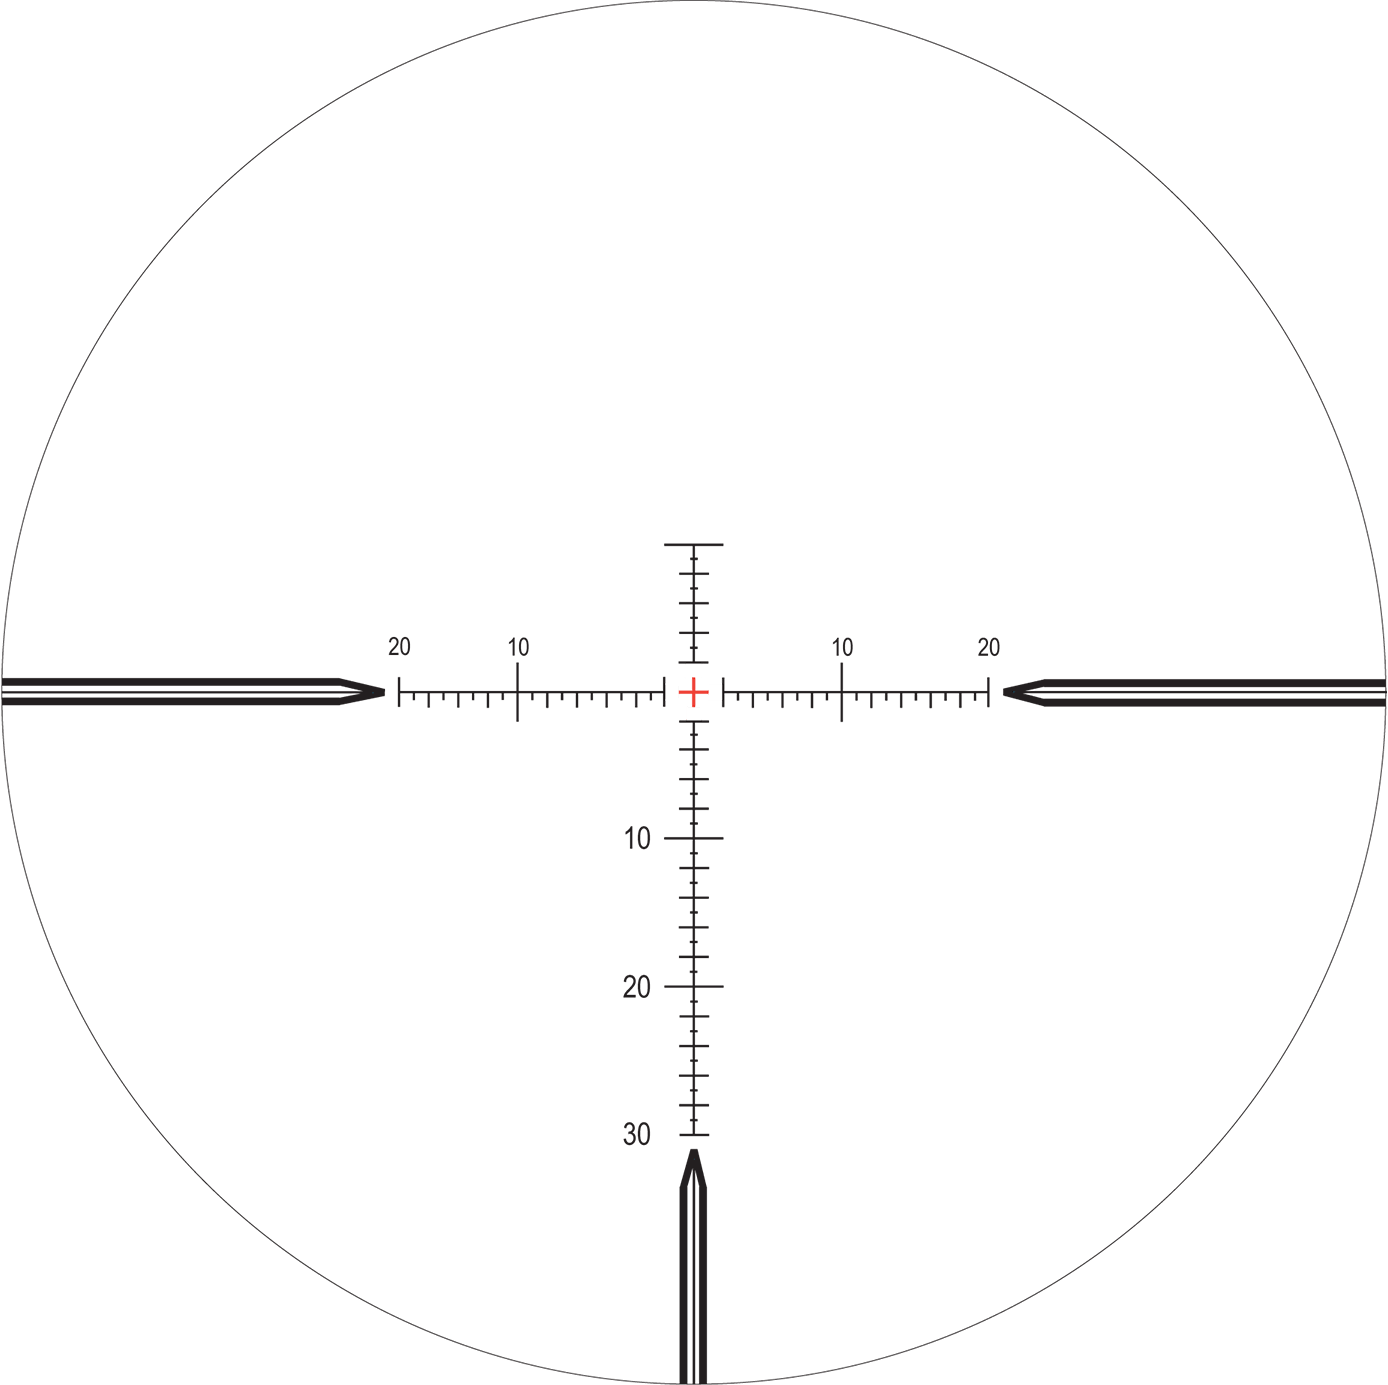 Reticle_Images - MOAR-CI__R205__SHV4-14xF1_14x